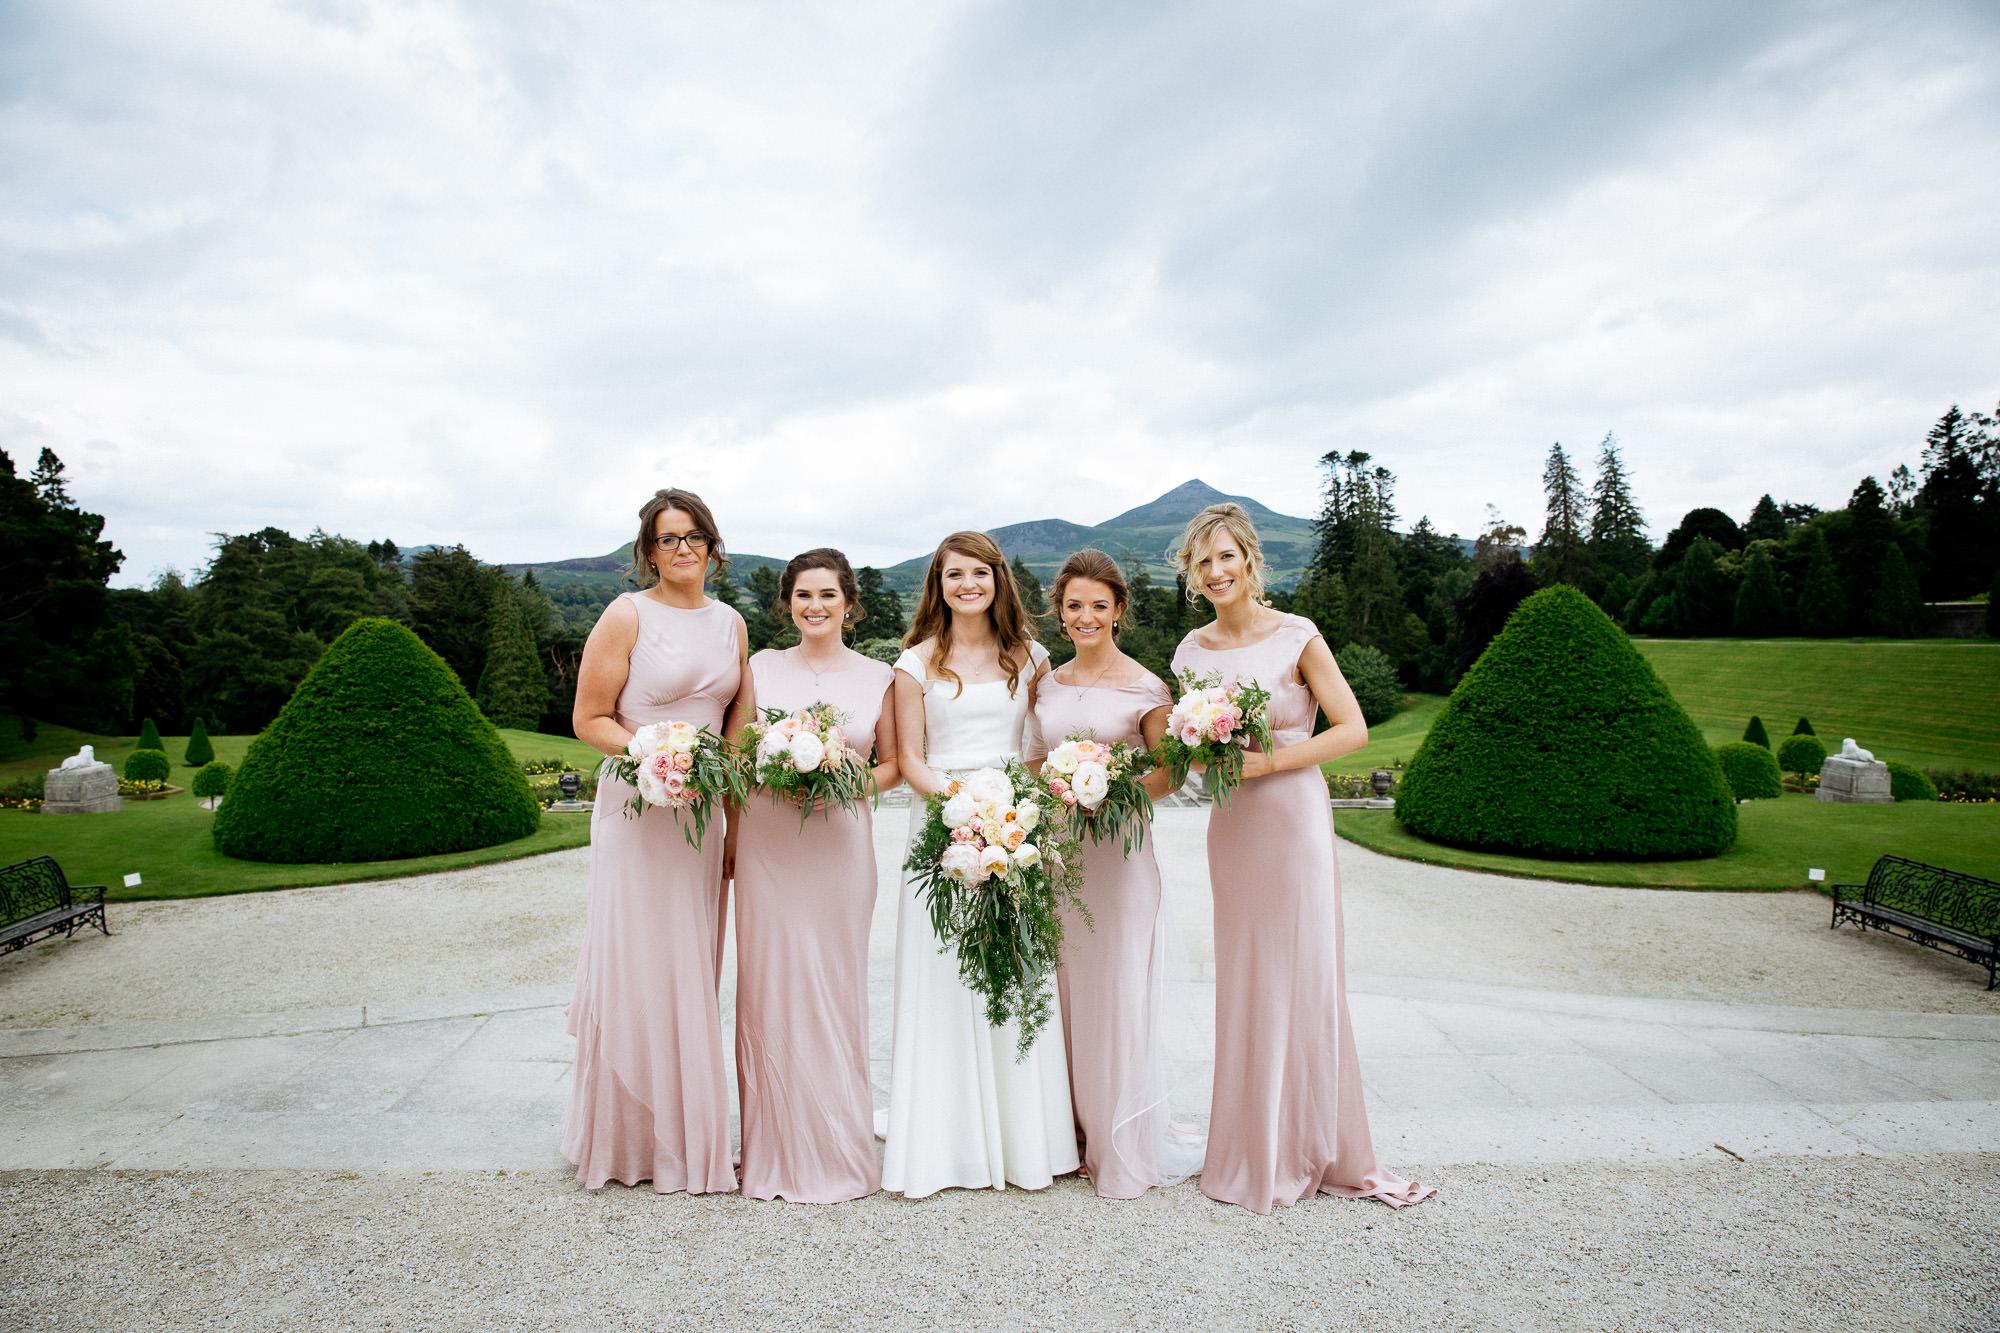 clairebyrnephotography-wedding-Emma-Max-9.jpg